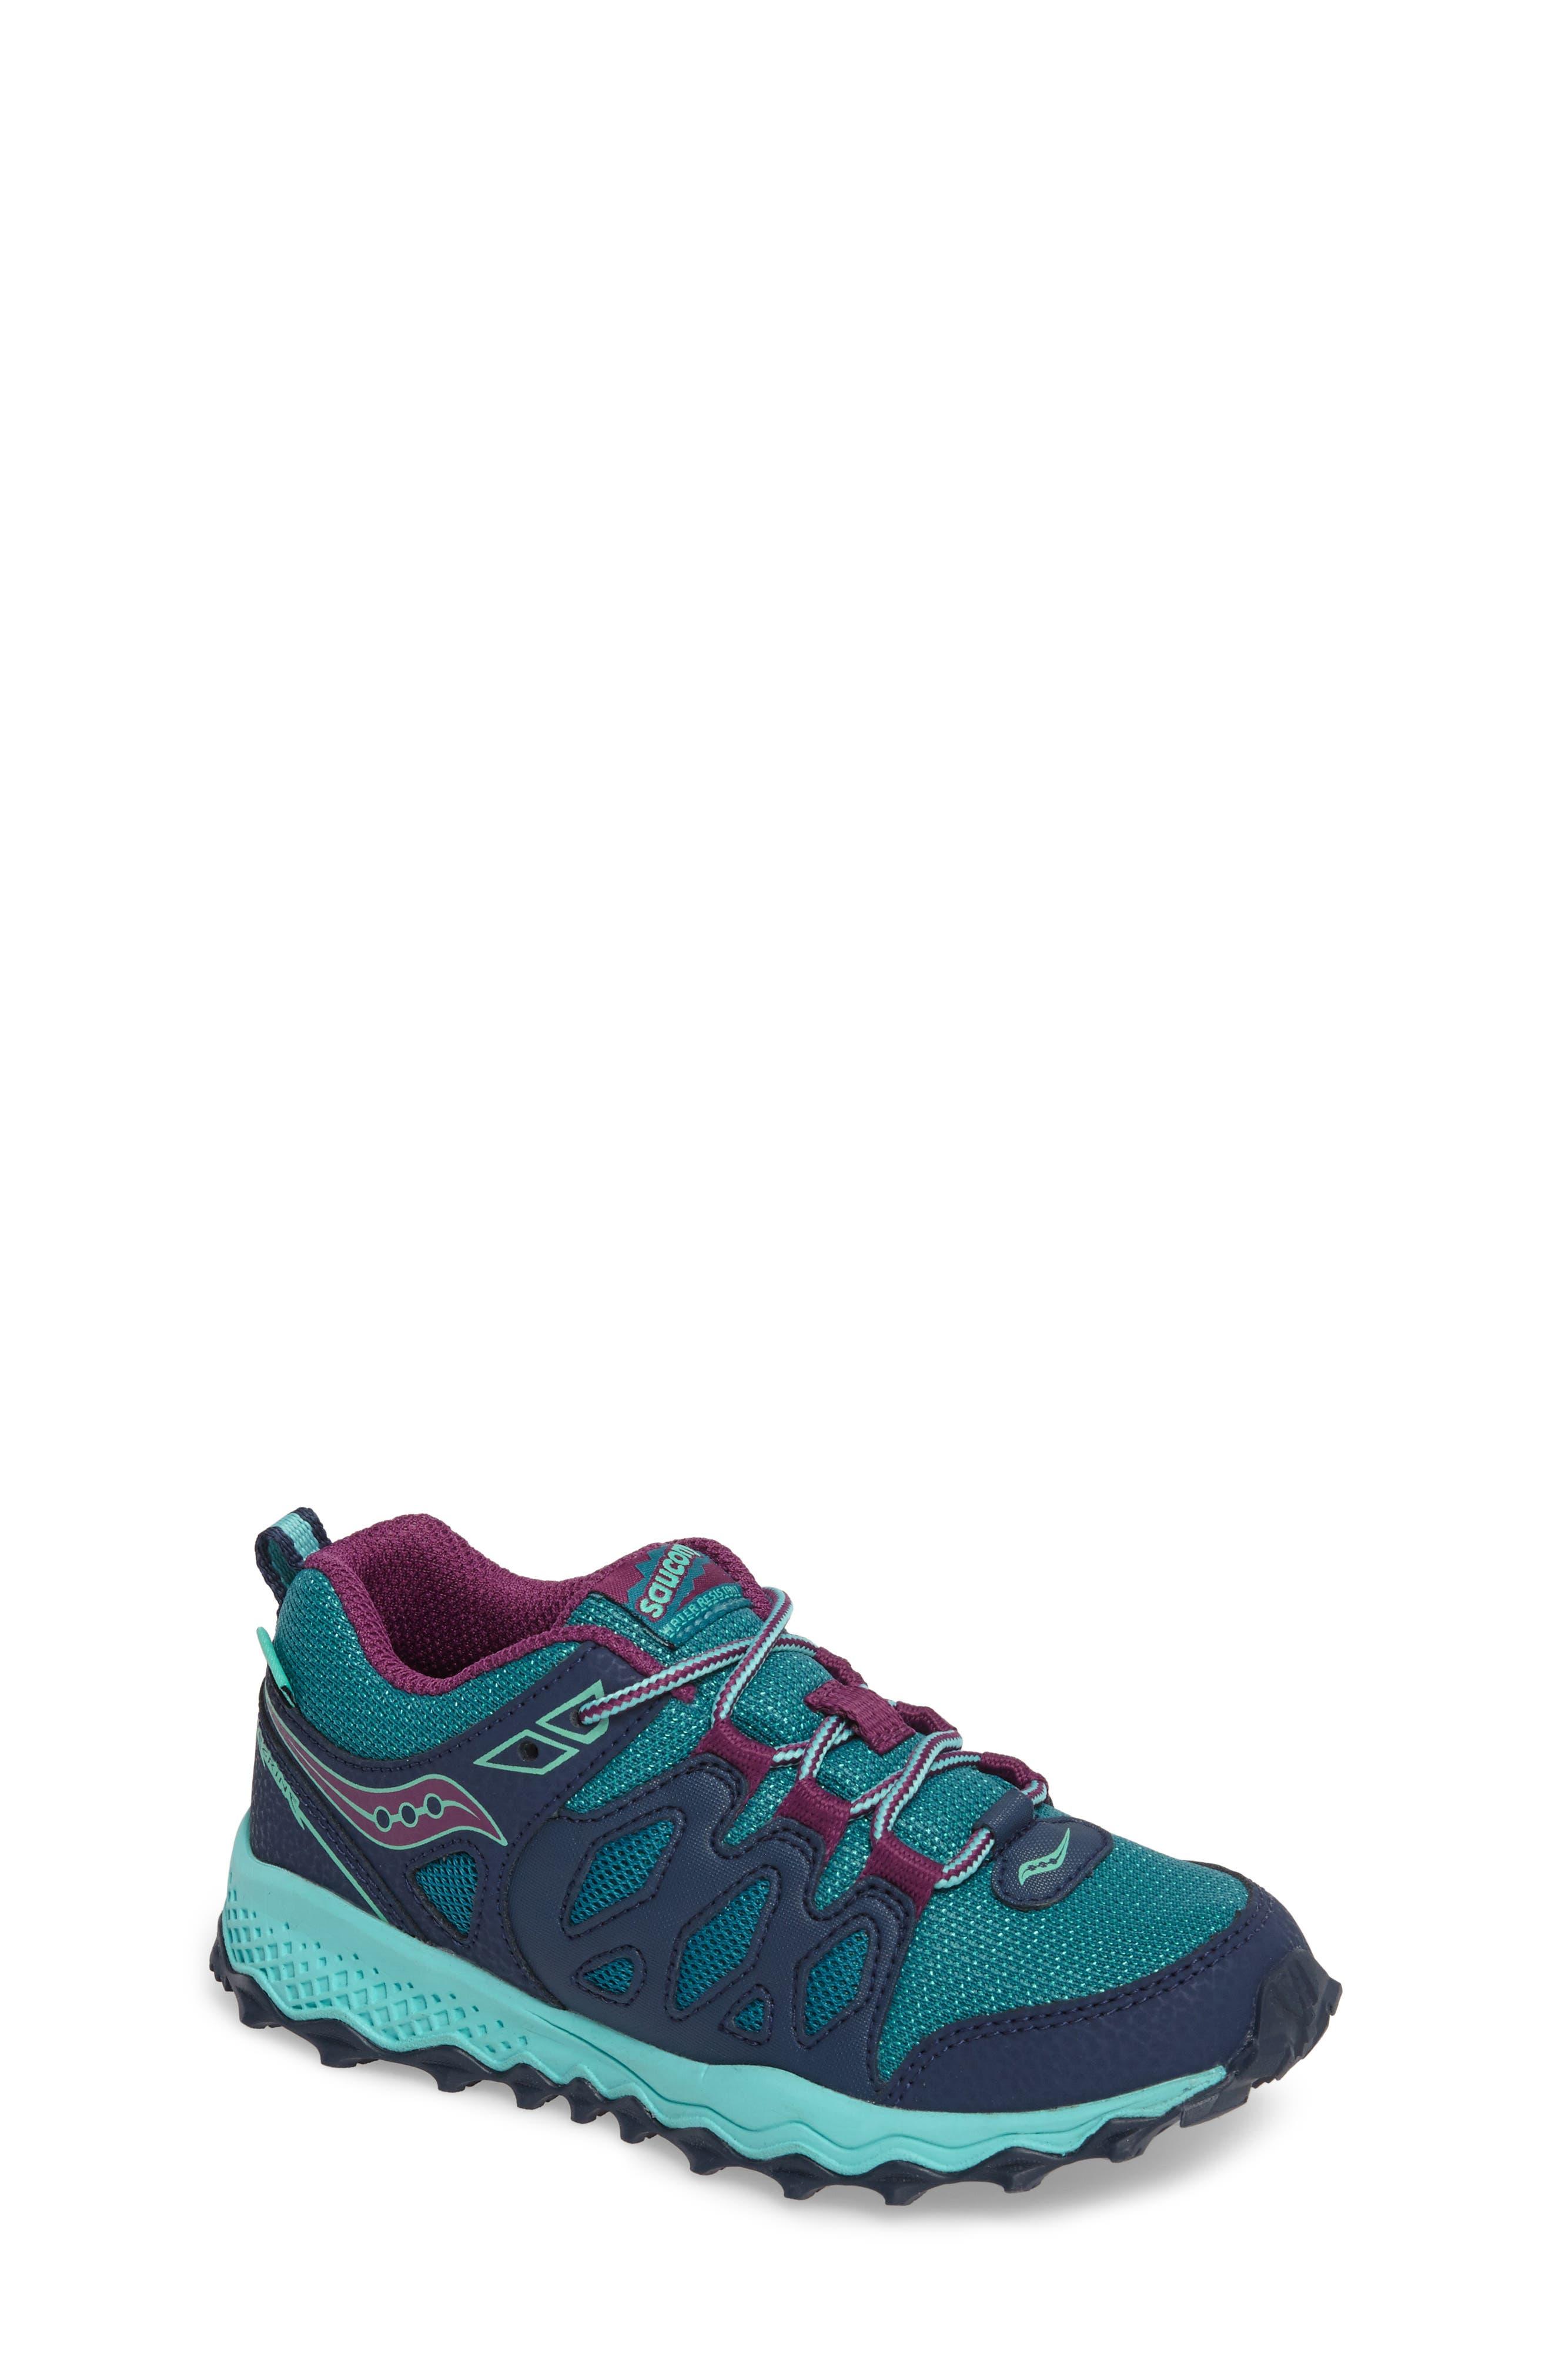 Peregrine Shield Water-Resistant Sneaker,                         Main,                         color, 440